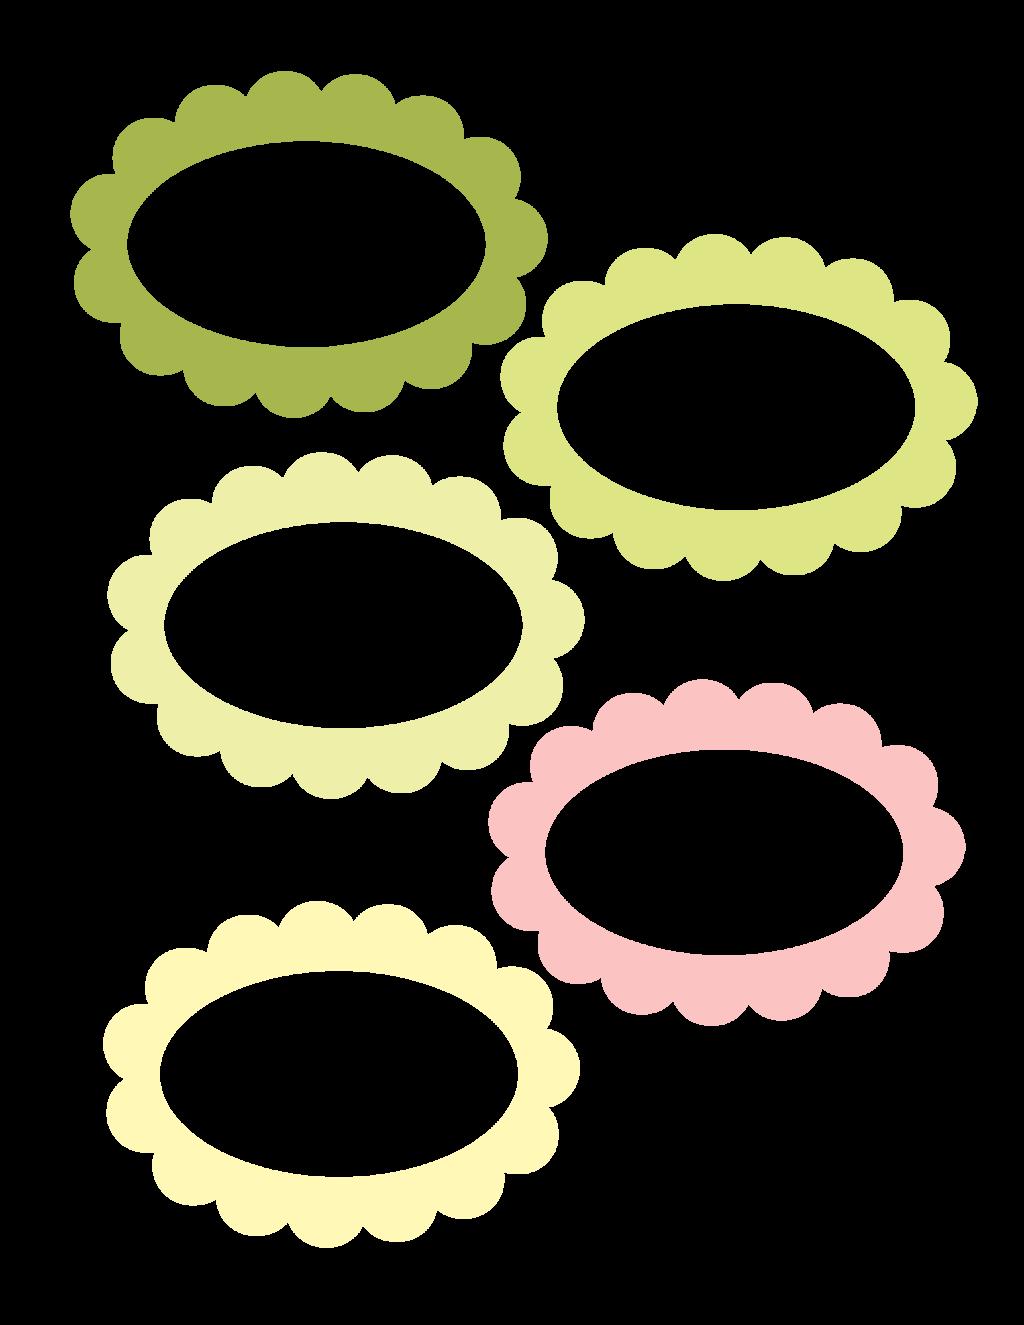 Limeaid oval no background. Frame clipart chocolate